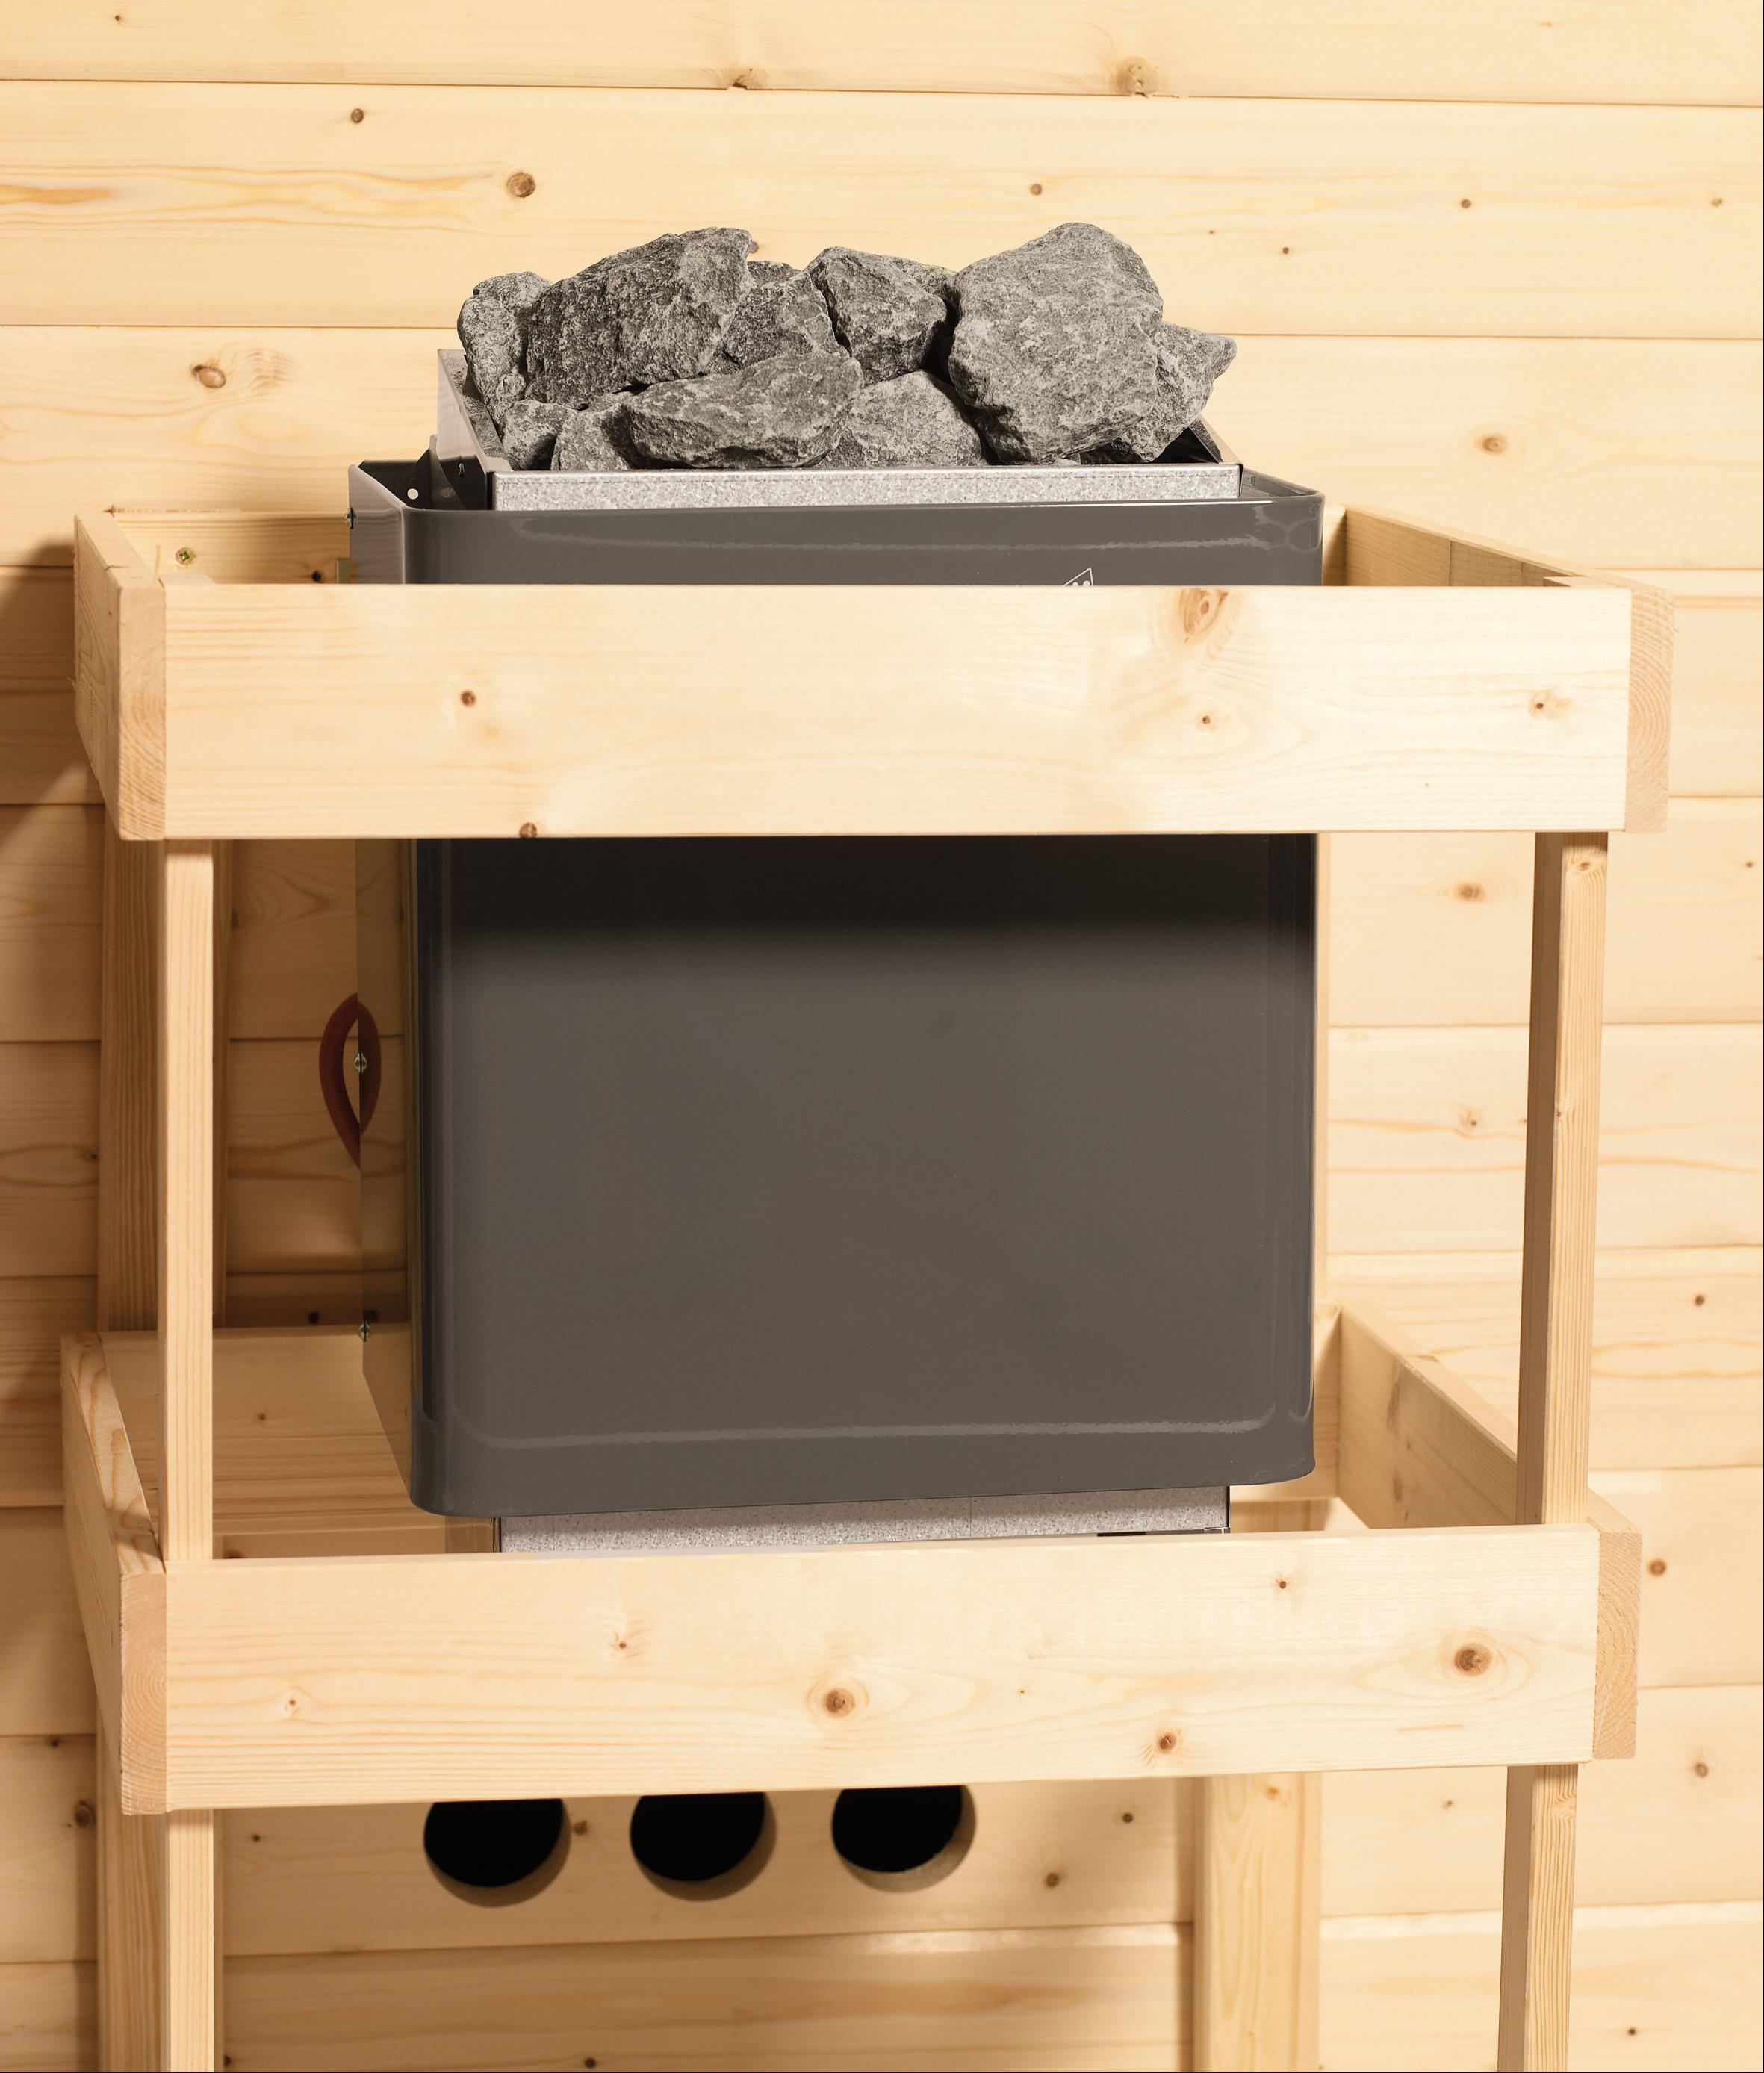 Woodfeeling Sauna Karla 38mm Ofen 9kW extern Tür Classic Bild 9